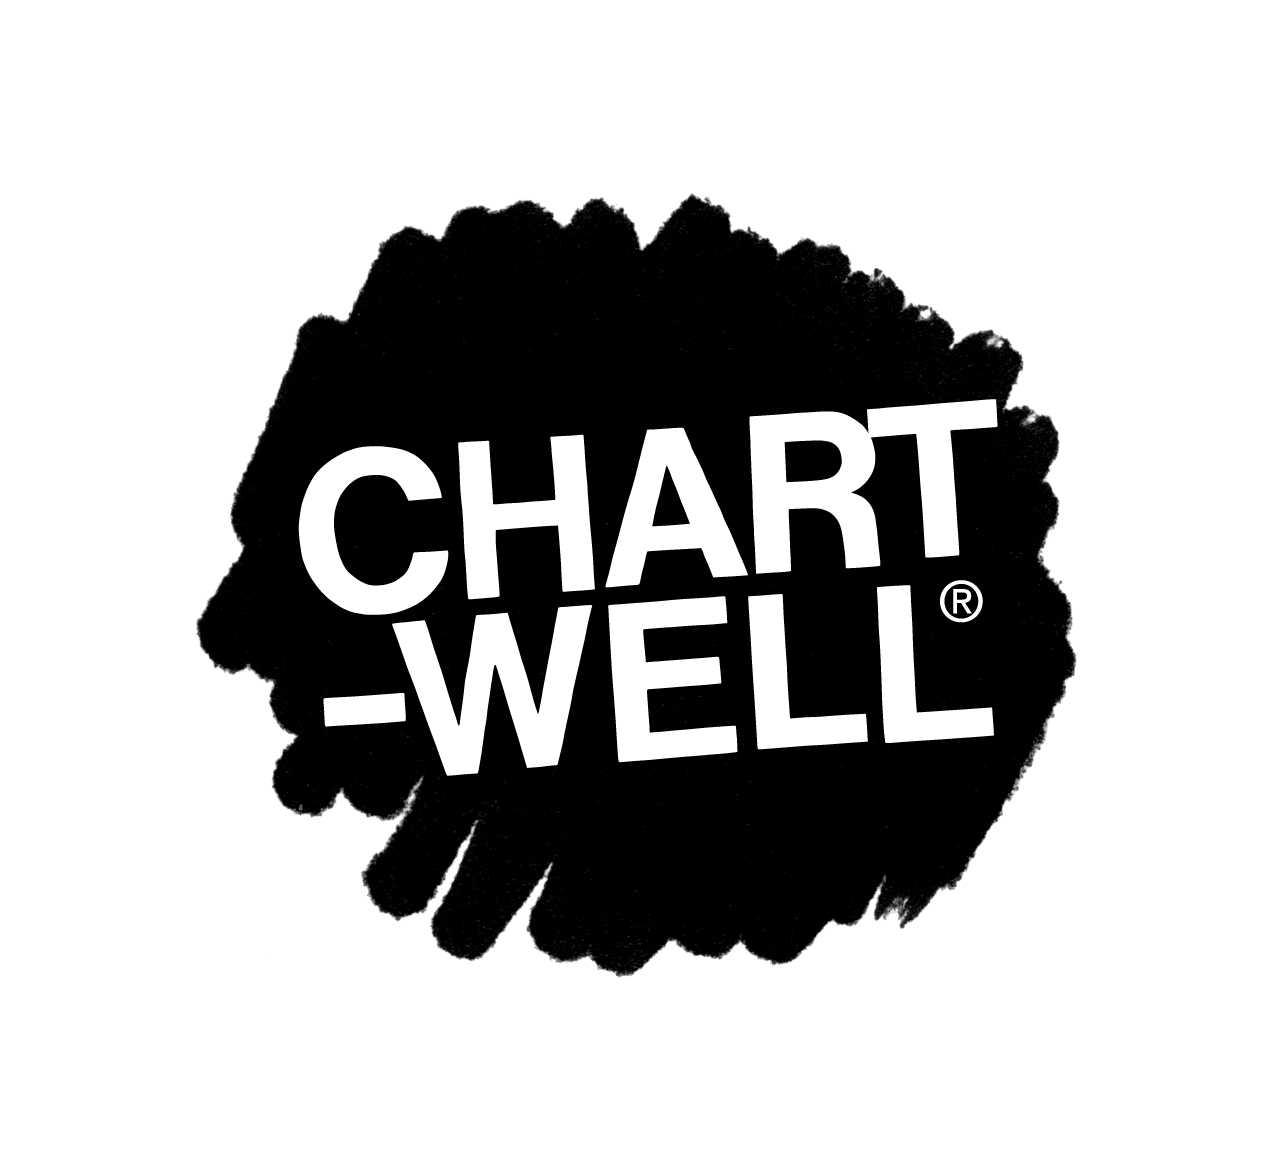 chartwell_identity_B (1)